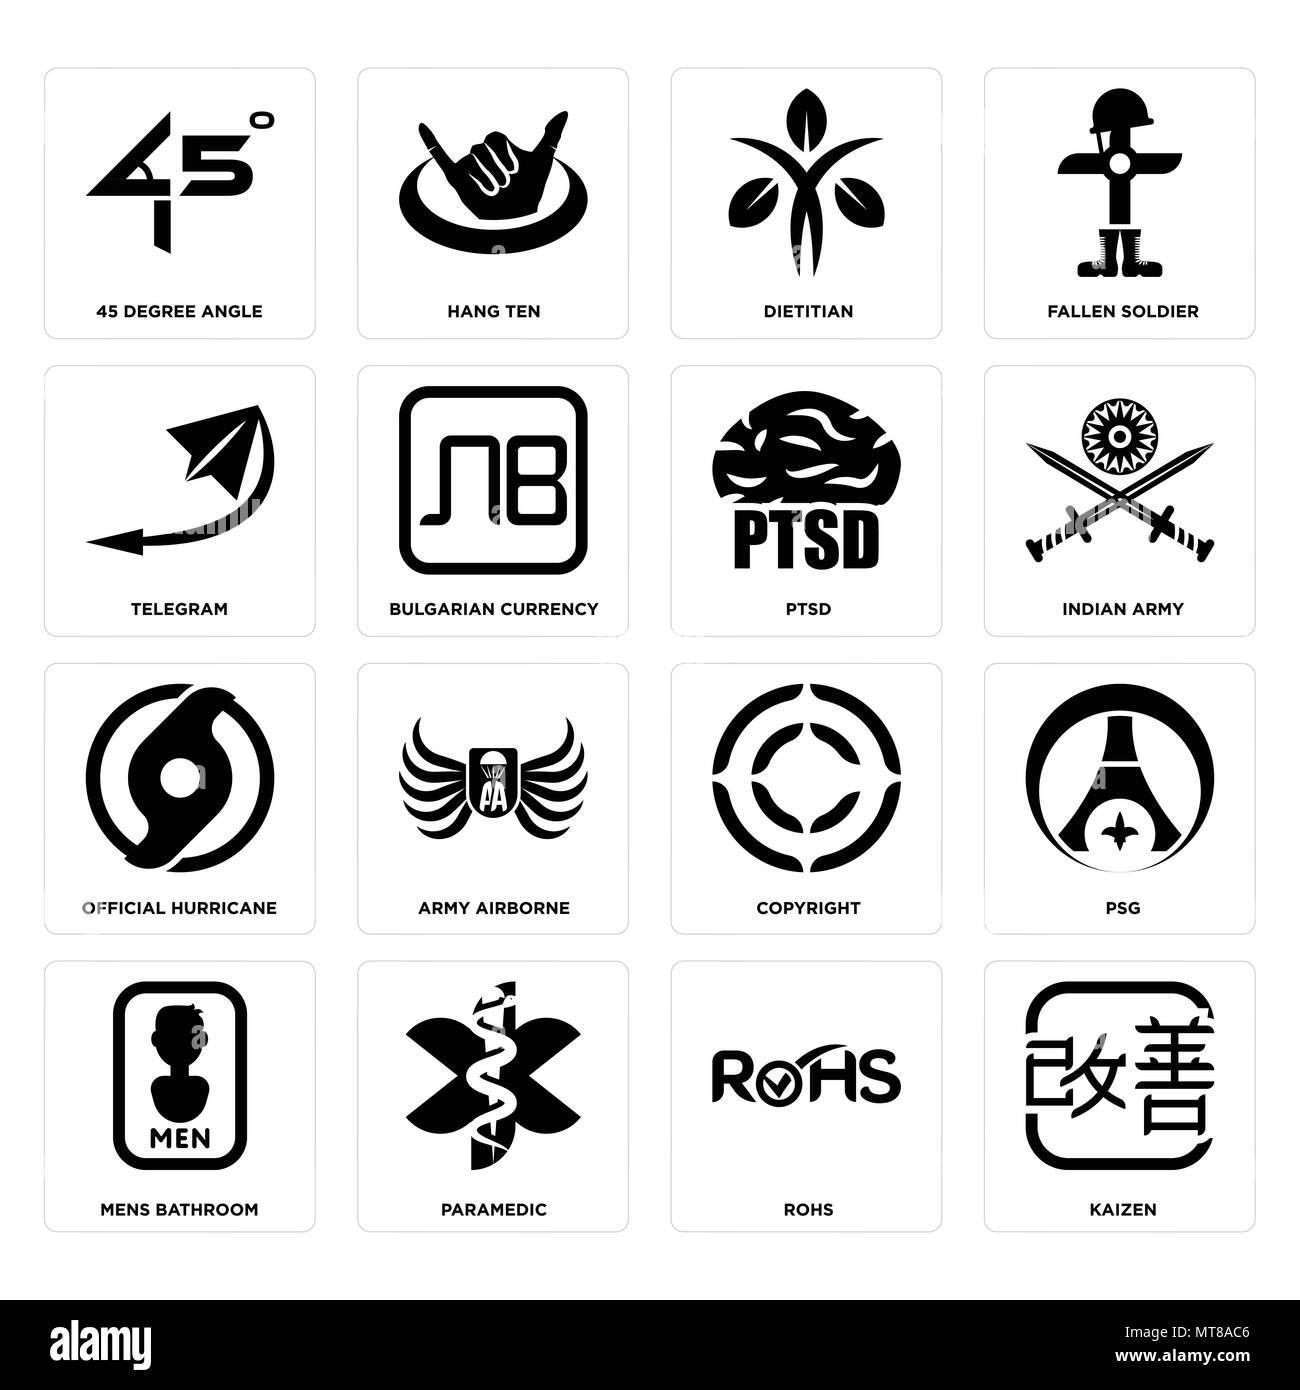 16 einfache editierbare ikonen wie kaizen, rohs, sanitäter, mens